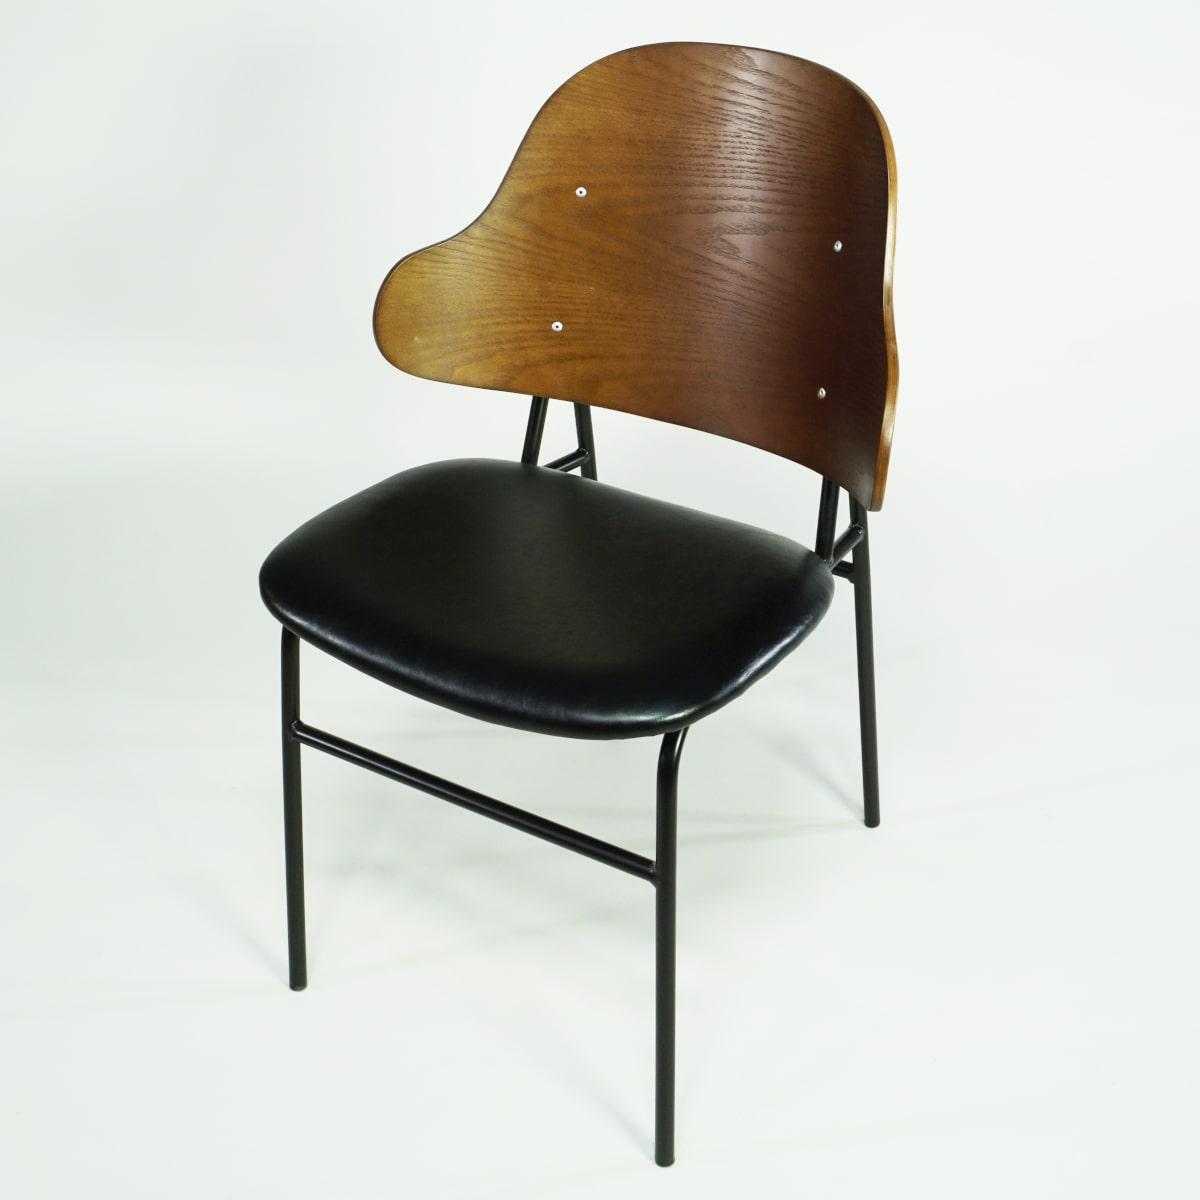 Esszimmer Design Stuhl Holz Metall